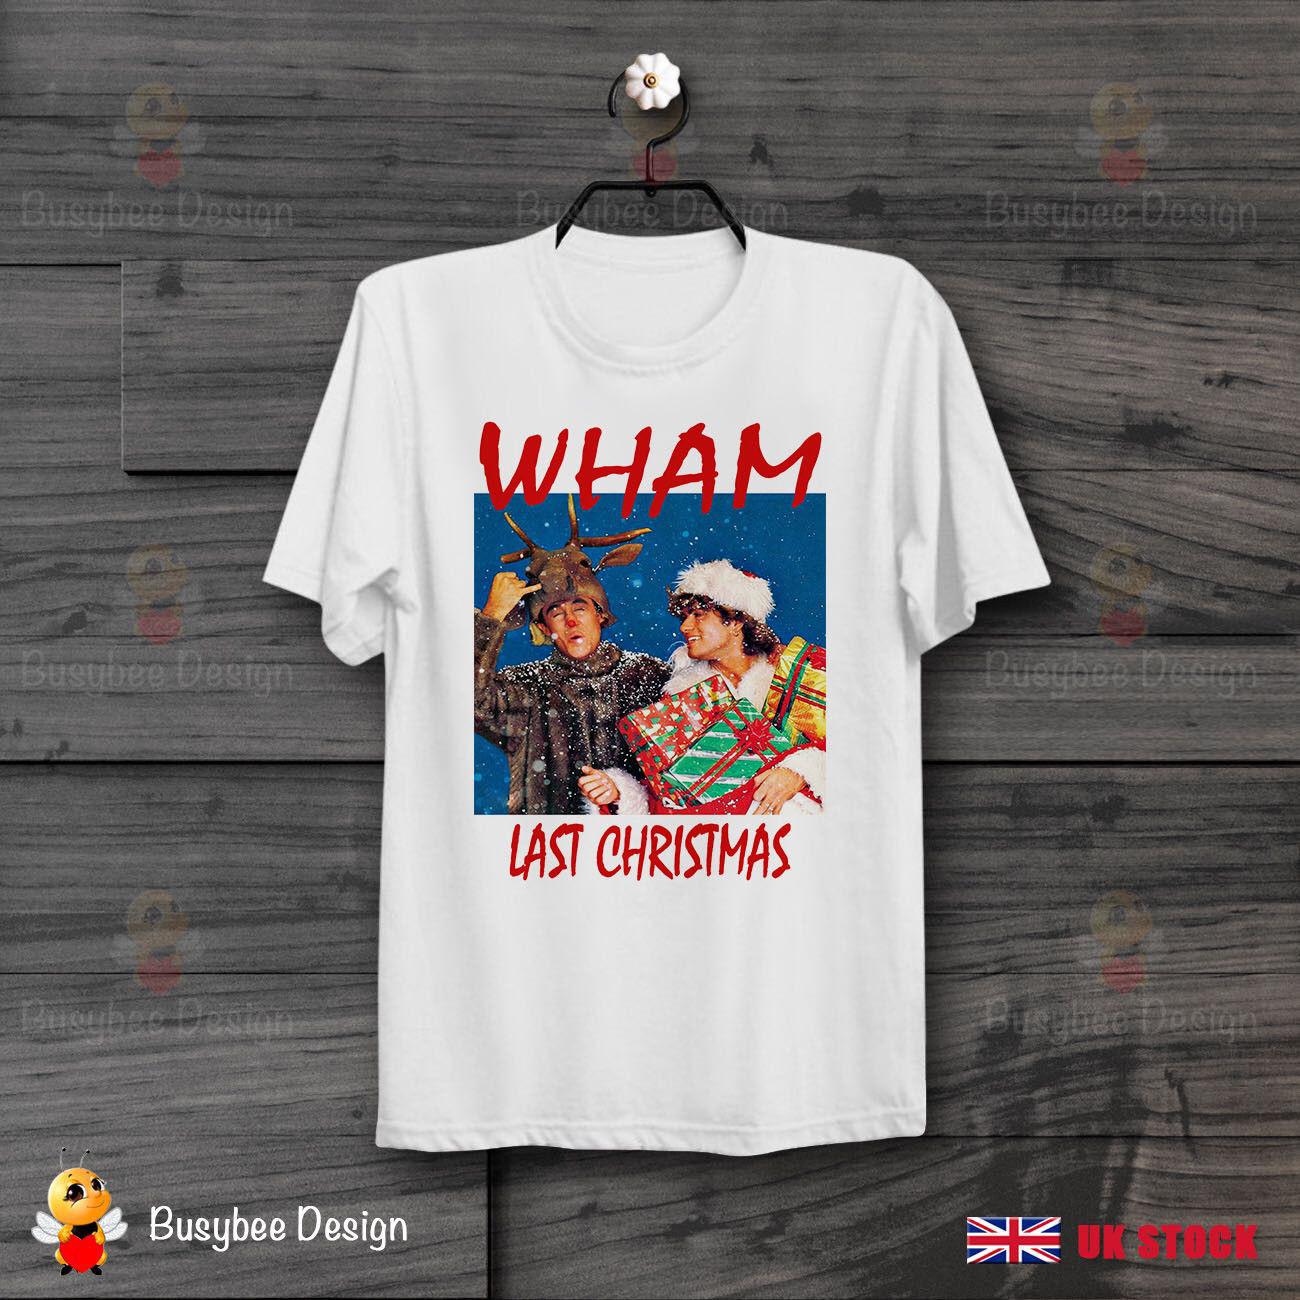 George Michael Wham Last Christmas Retro Cool Ideal GIFT UNISEX T Shirt B415 hip hop funny tee mens tee shirts summer o neck tee